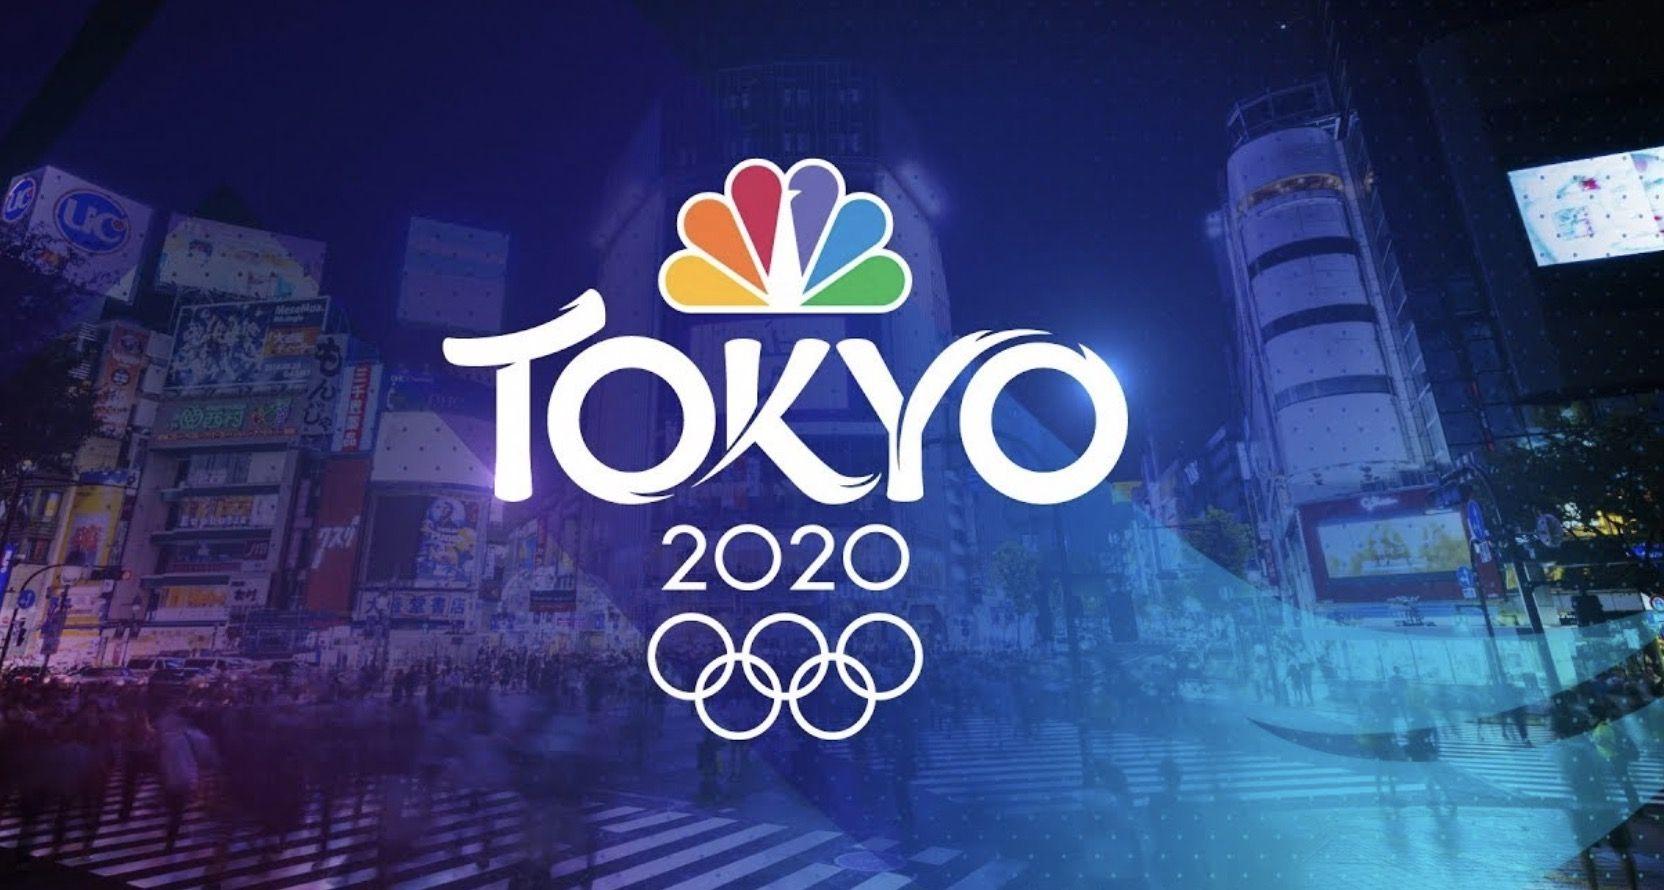 Tokio 2020, giochi olimpici, cio